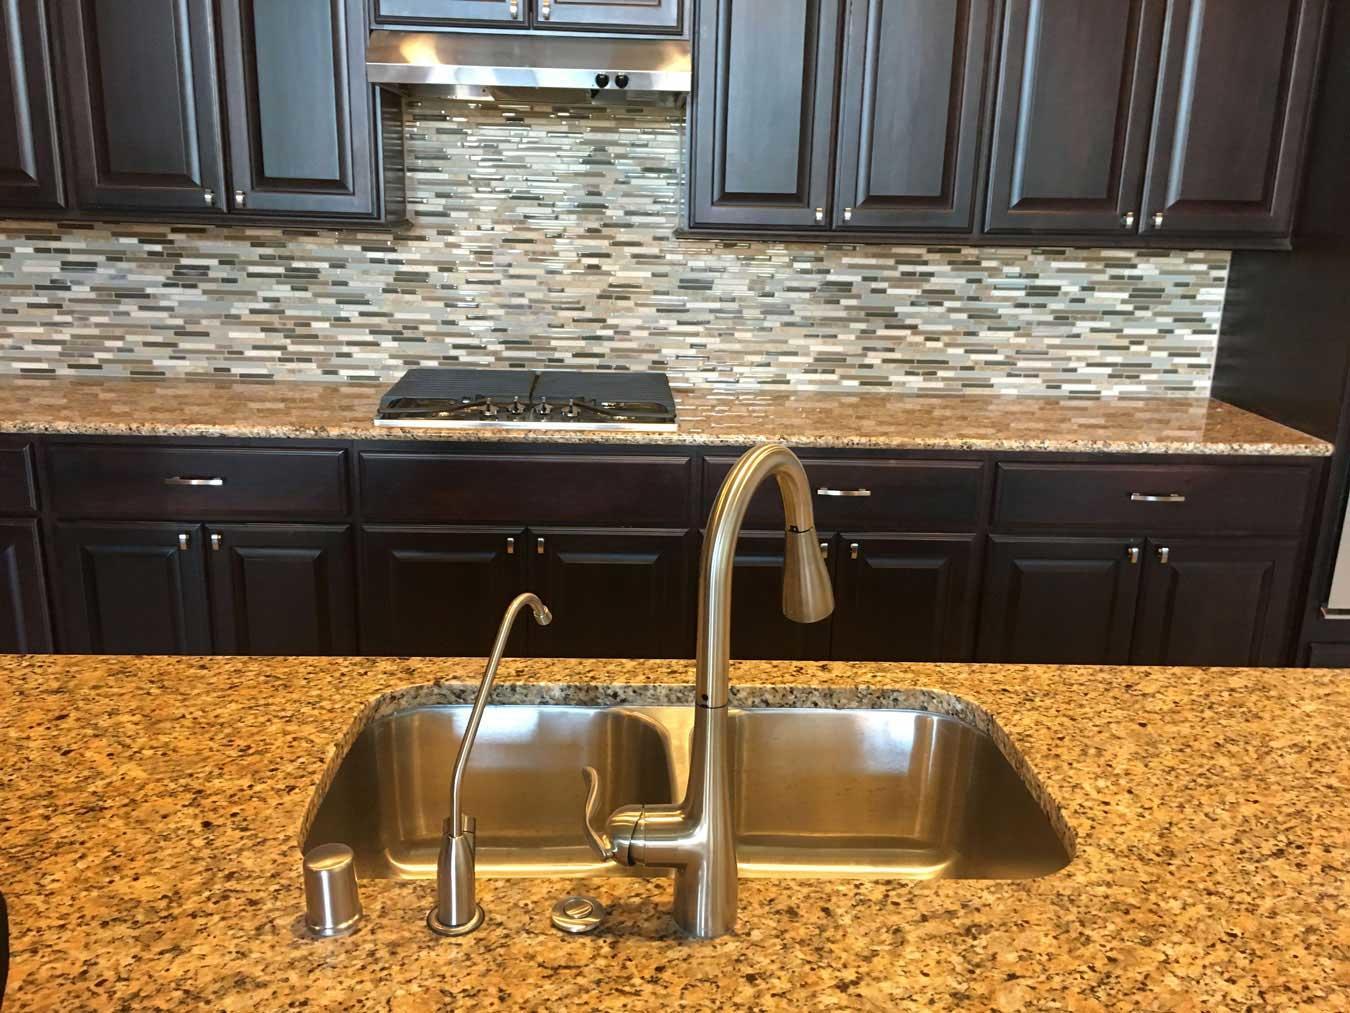 Artech design inc - DBA Floors Kitchen and Bath image 7